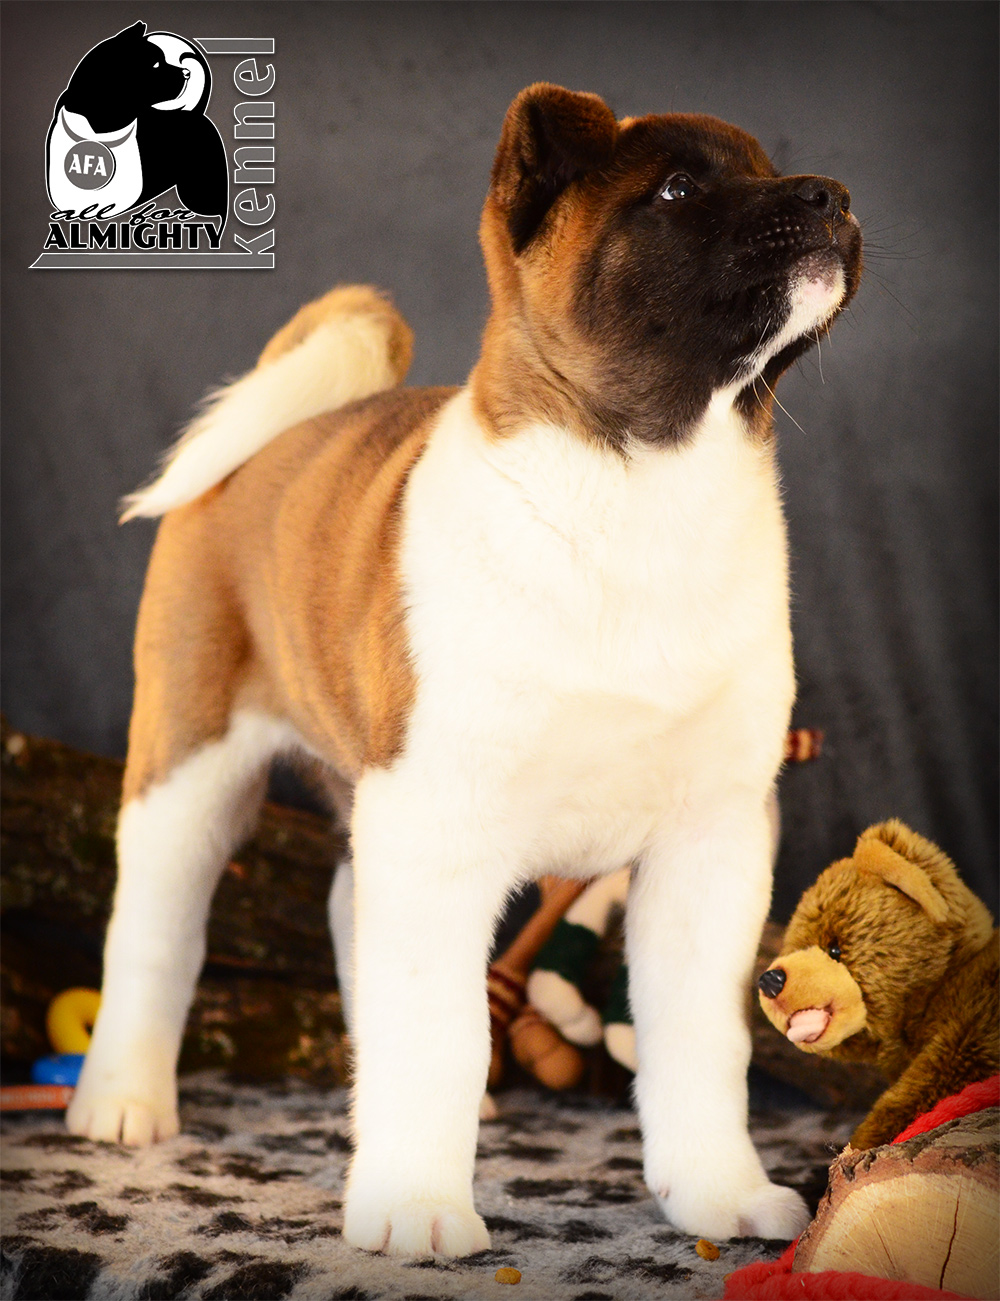 #bestakitapuppies #akitaamericano #kennel #akitakennel #akitamoscow #puppiesavailable #newakitalitter #dogforshow #kennelakita #dogshow # worlddogshow #NDS #FCI-dogs #pedigree #akitabreeder #almightykennel #dogphoto #bestdogsphoto #IDS